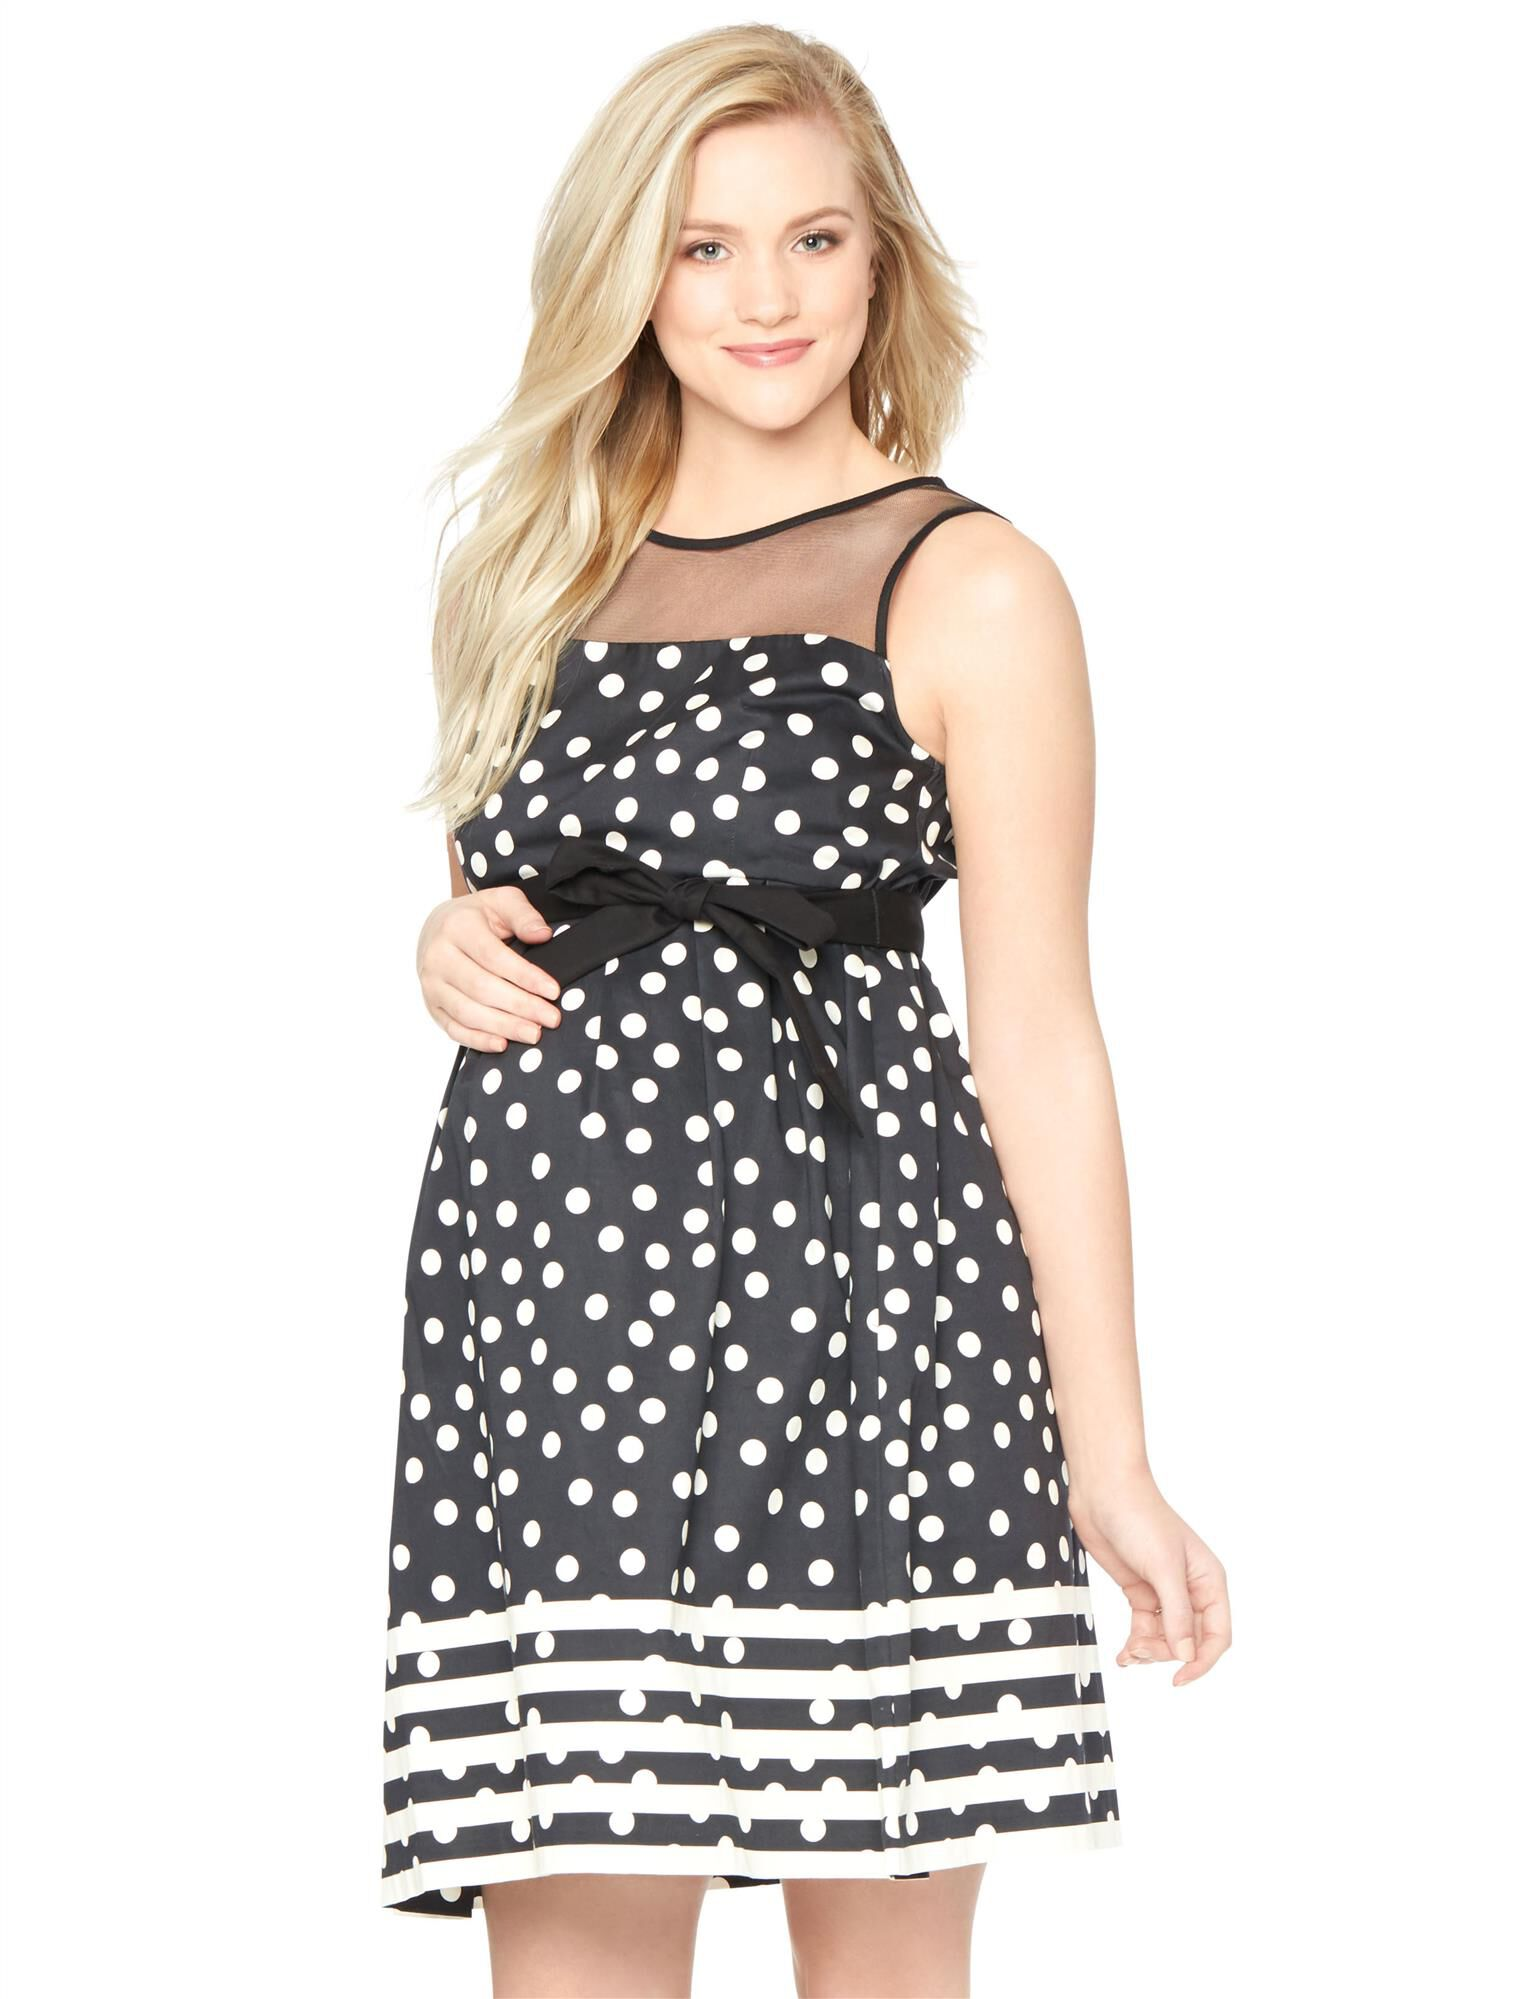 Vintage Style Maternity Clothes Dot Print Pleated Maternity Dress $24.97 AT vintagedancer.com